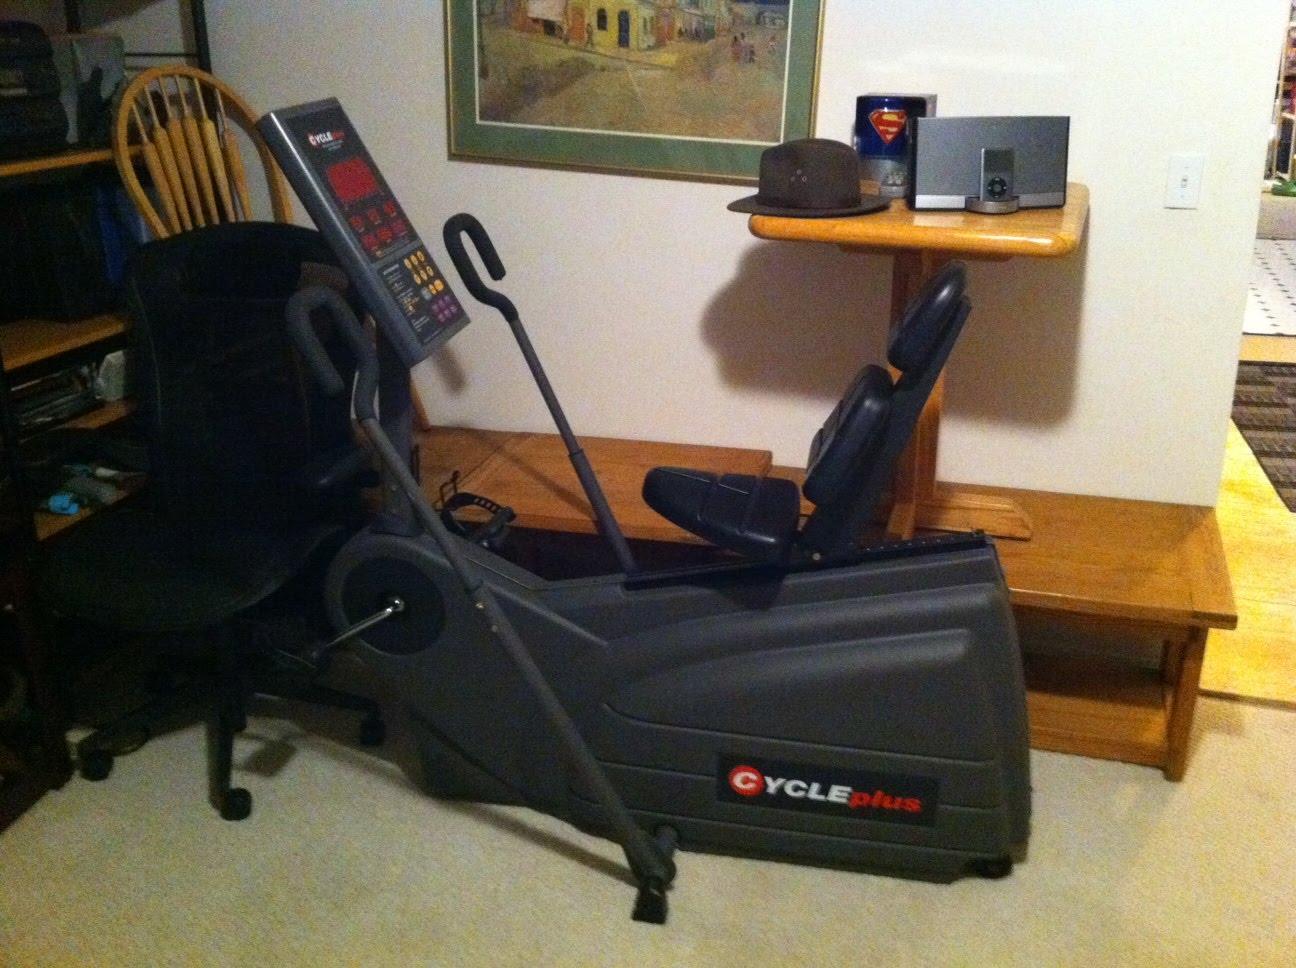 xterra sb540r recumbent exercise bike